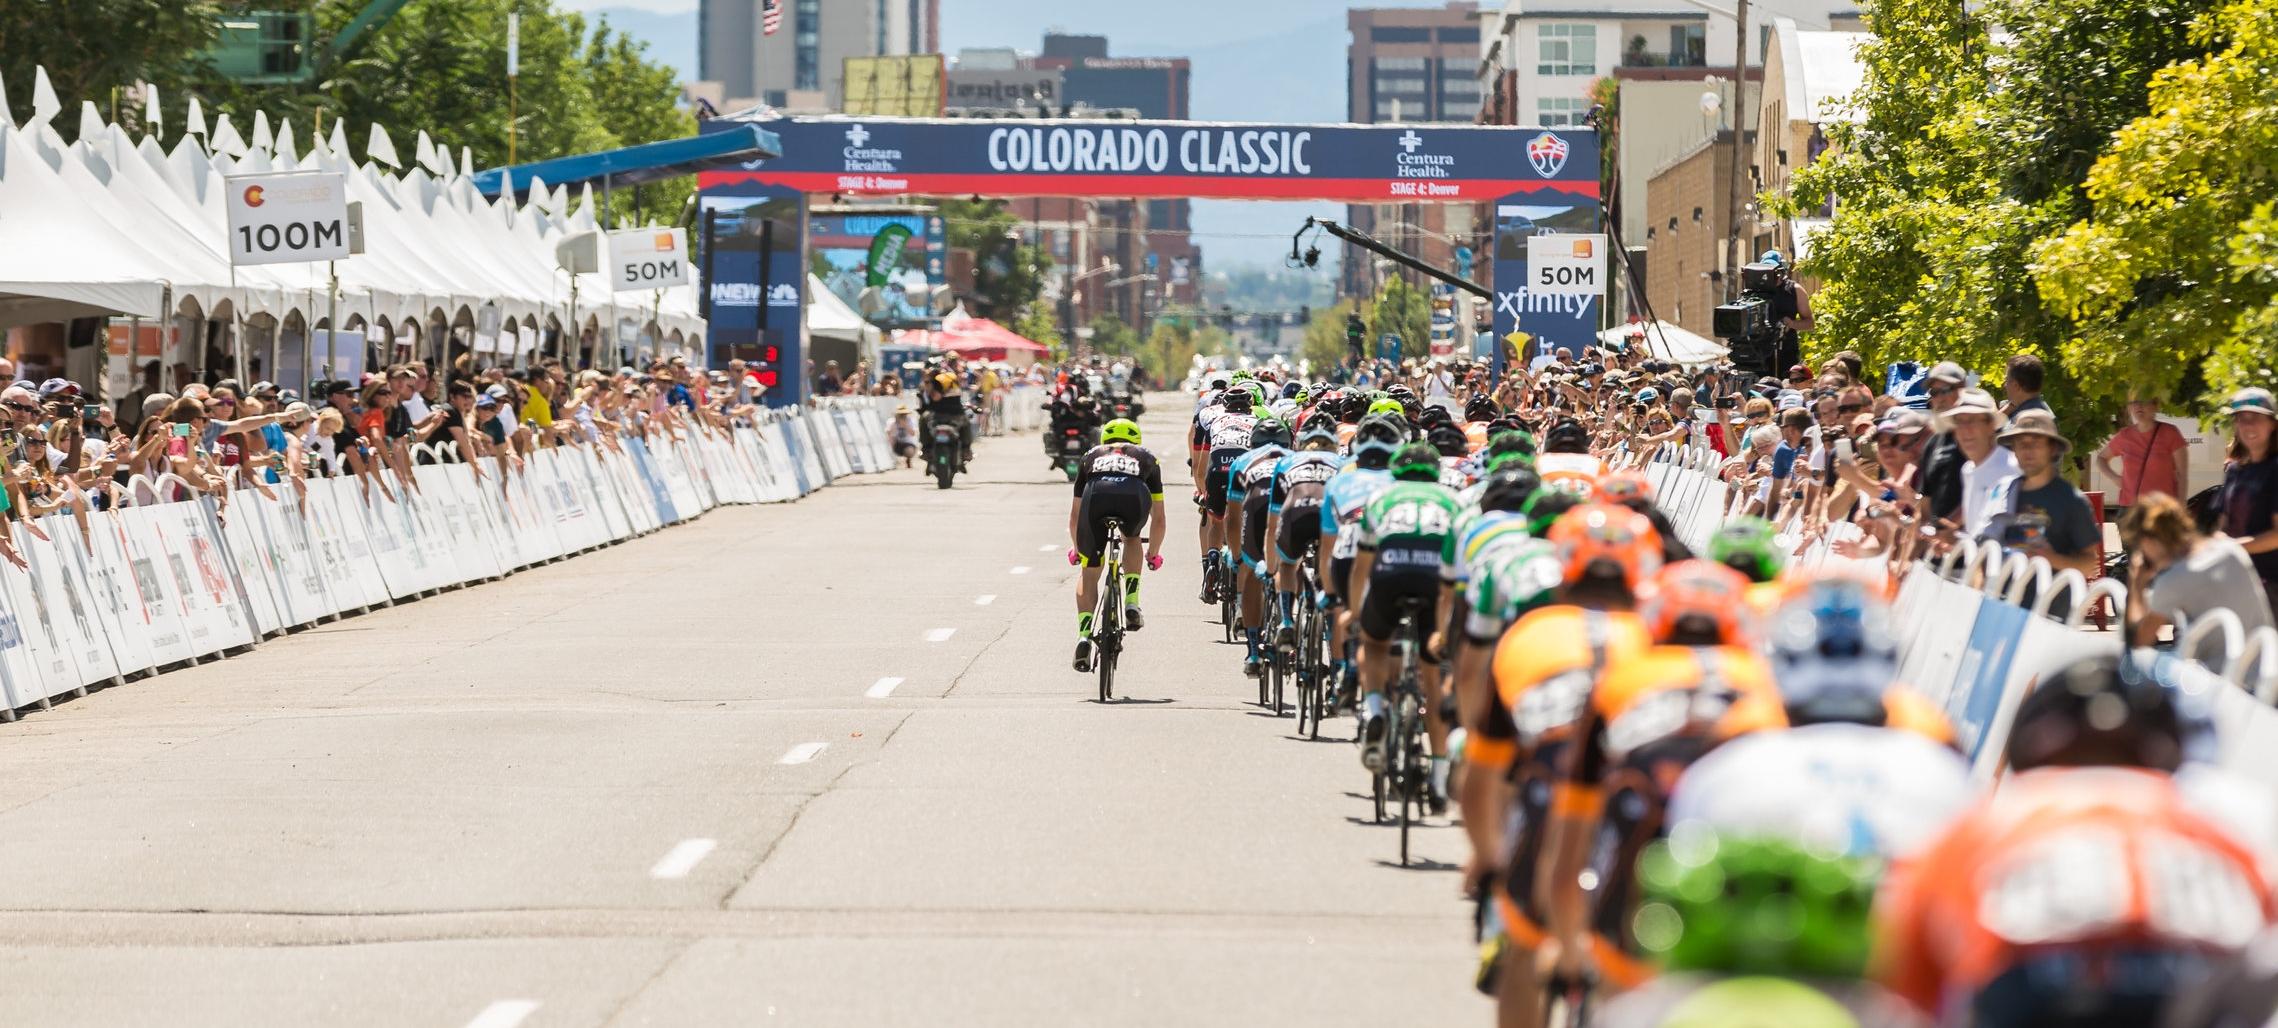 Colorado Classic